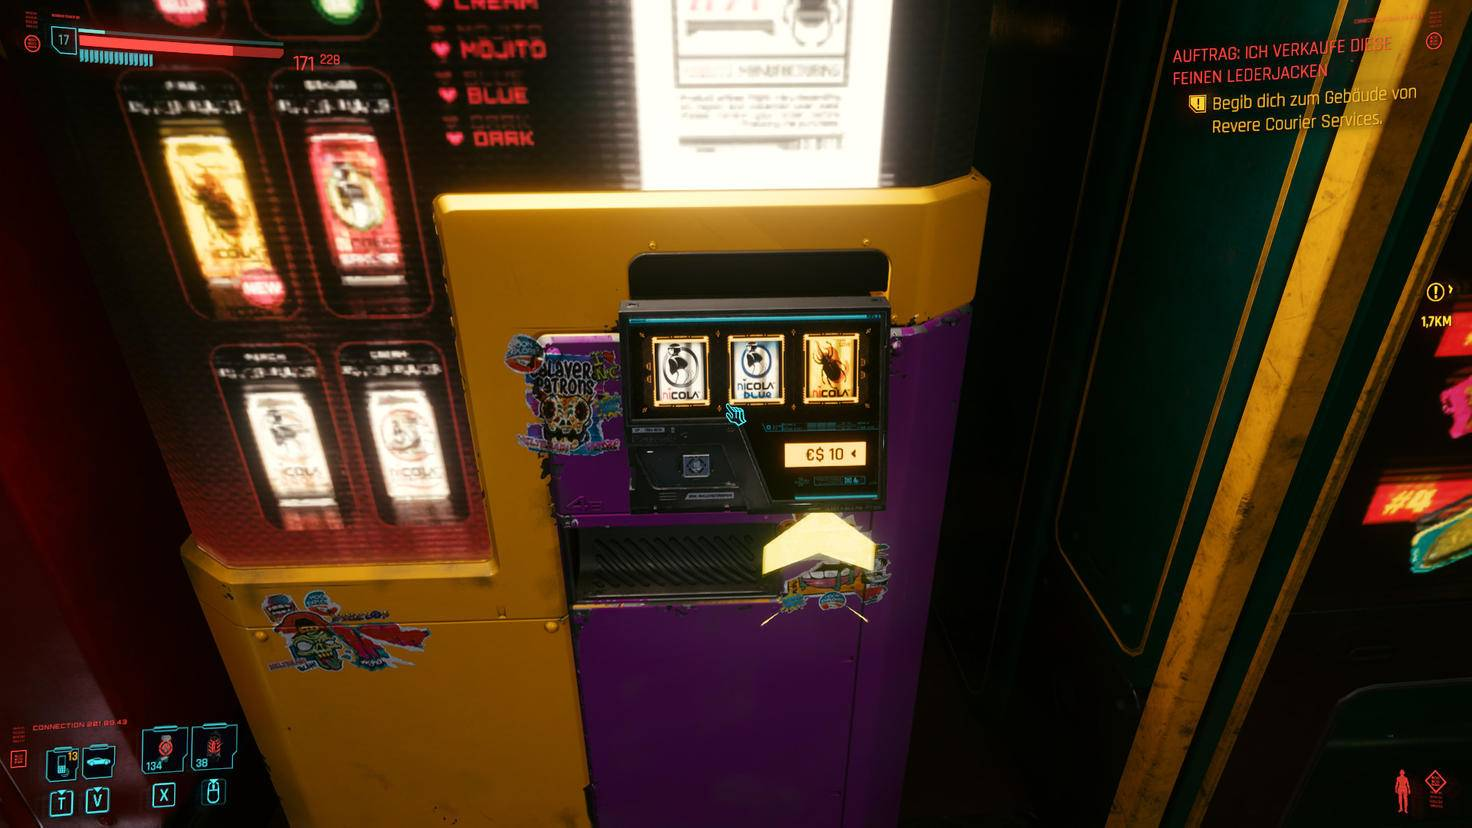 cyberpunk-2077-automat